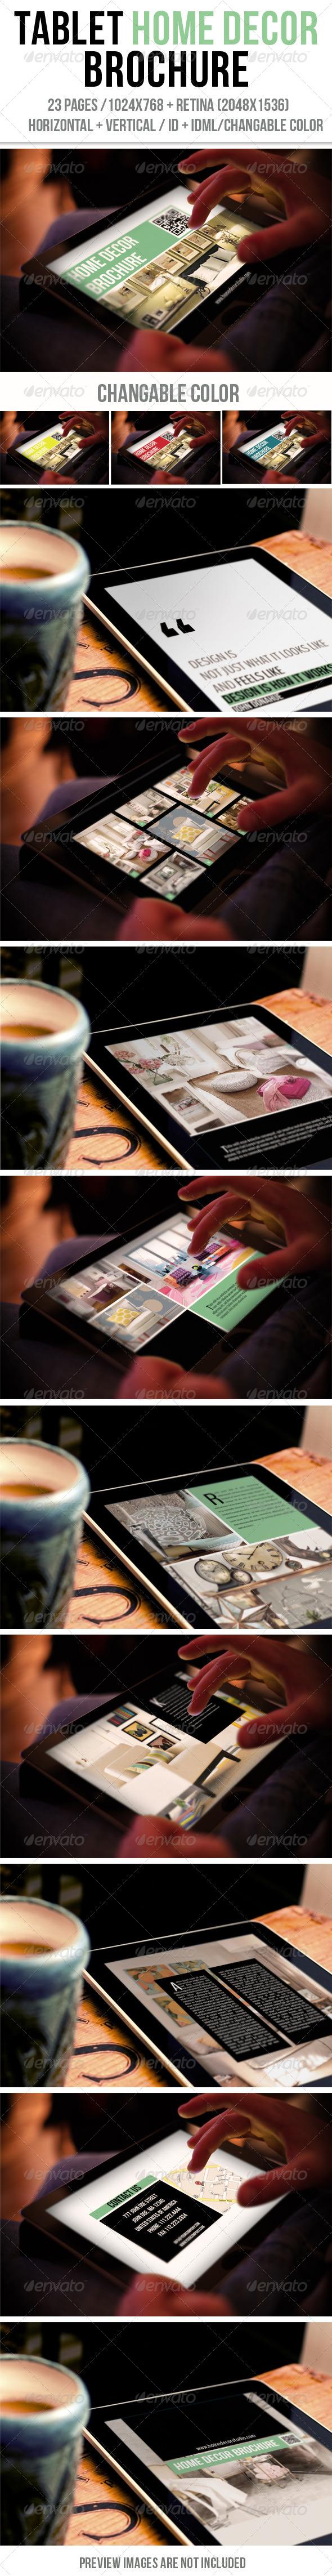 iPad & Tablet Home Decor Brochure - Digital Magazines ePublishing